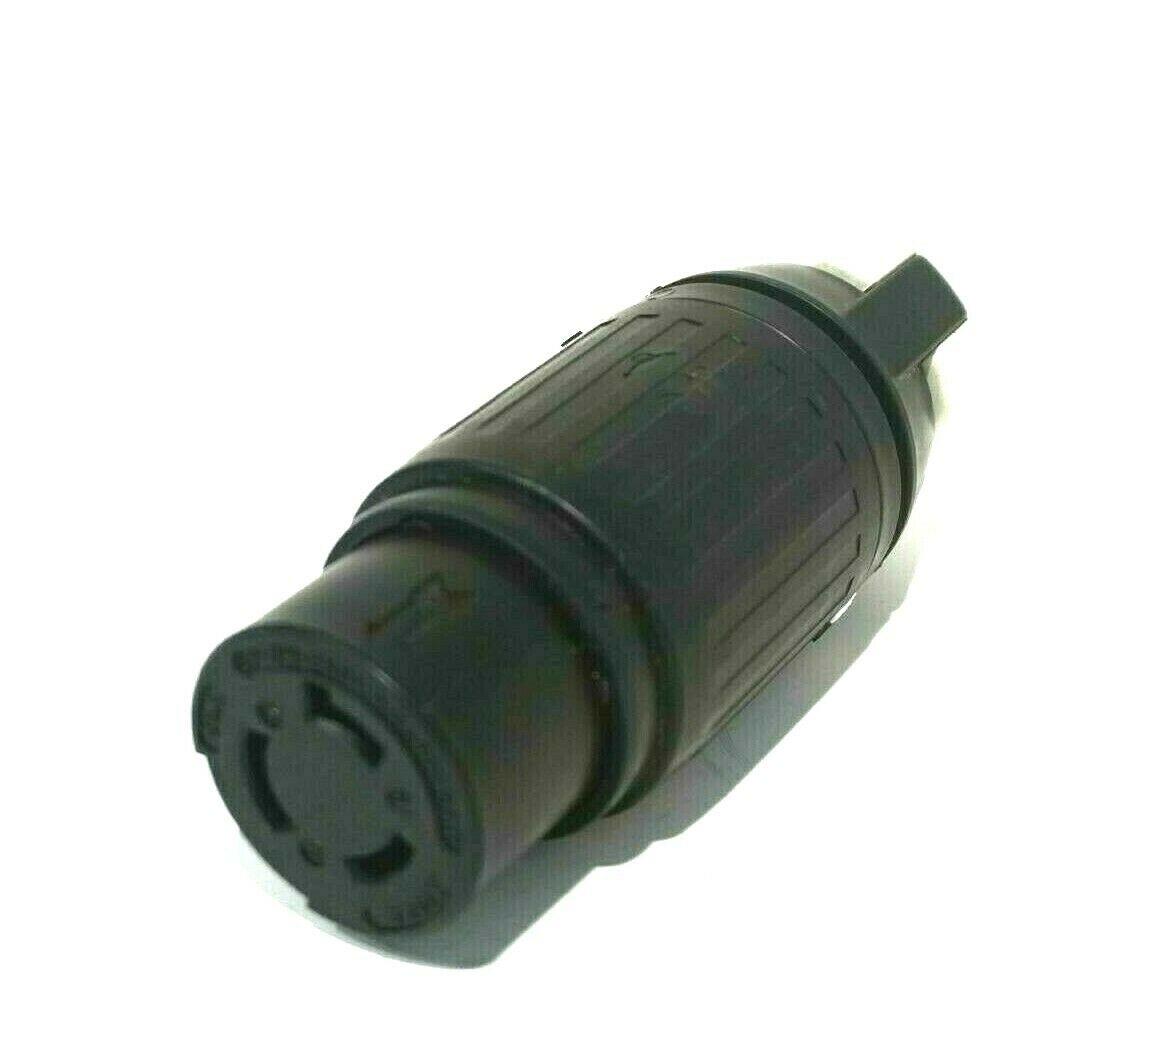 New Hubbell 3762c Twist Lock Connector Sb Industrial Supply